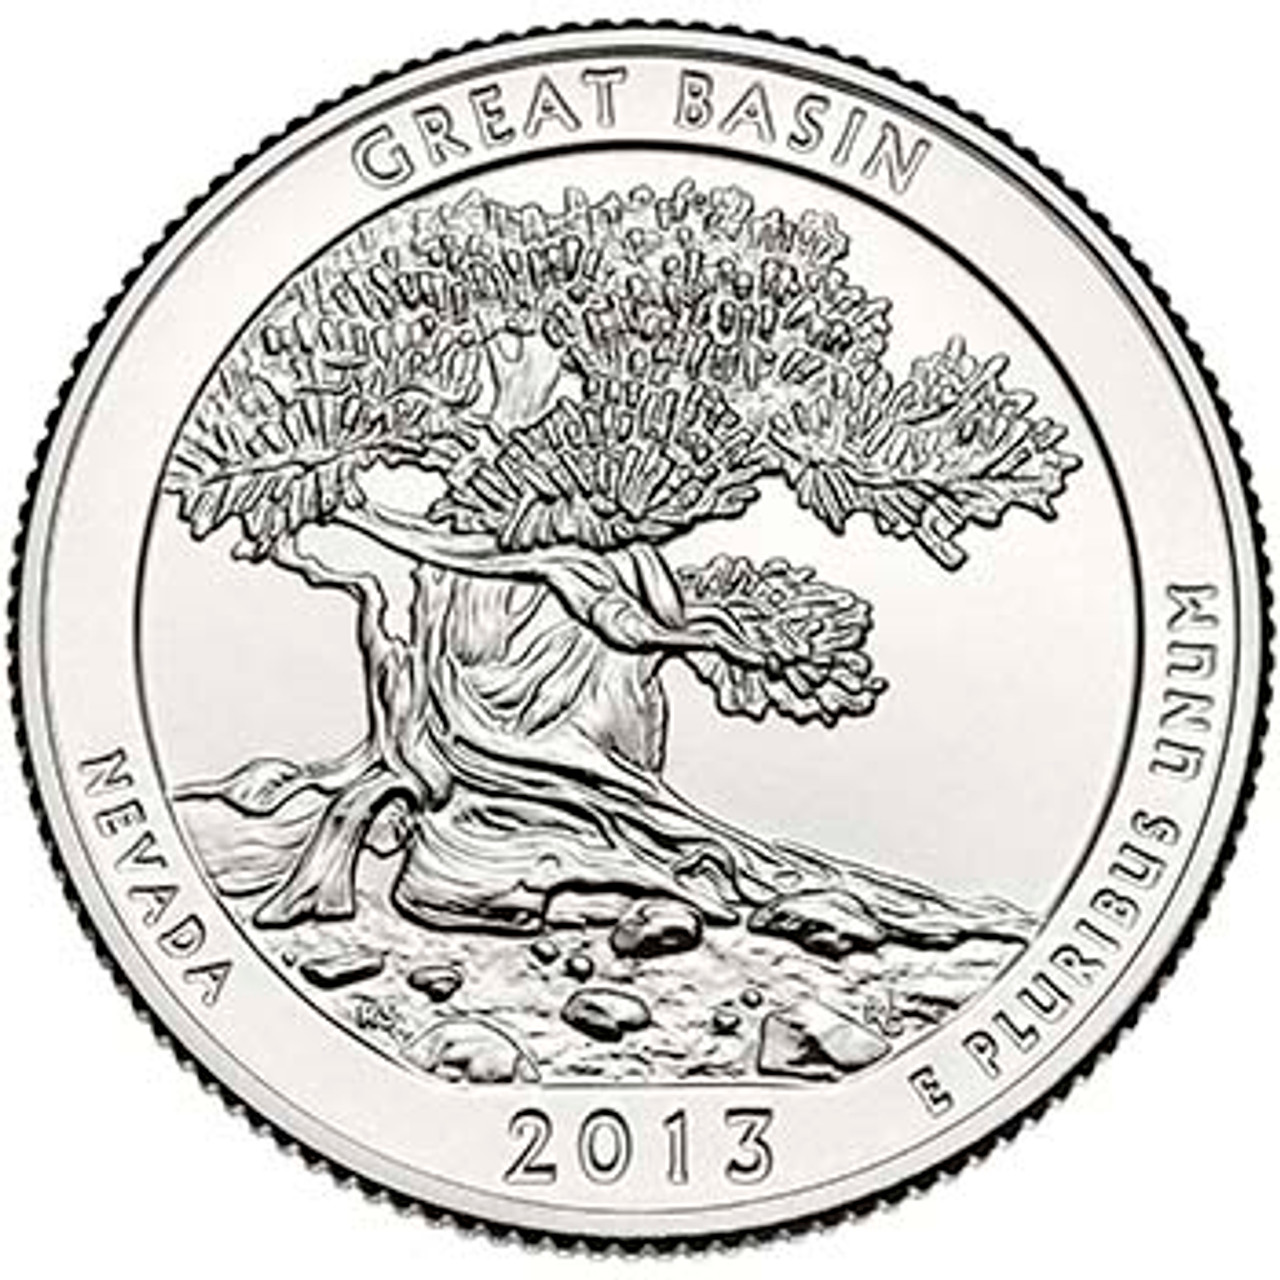 2013-P Great Basin National Park Quarter Brilliant Uncirculated Image 1